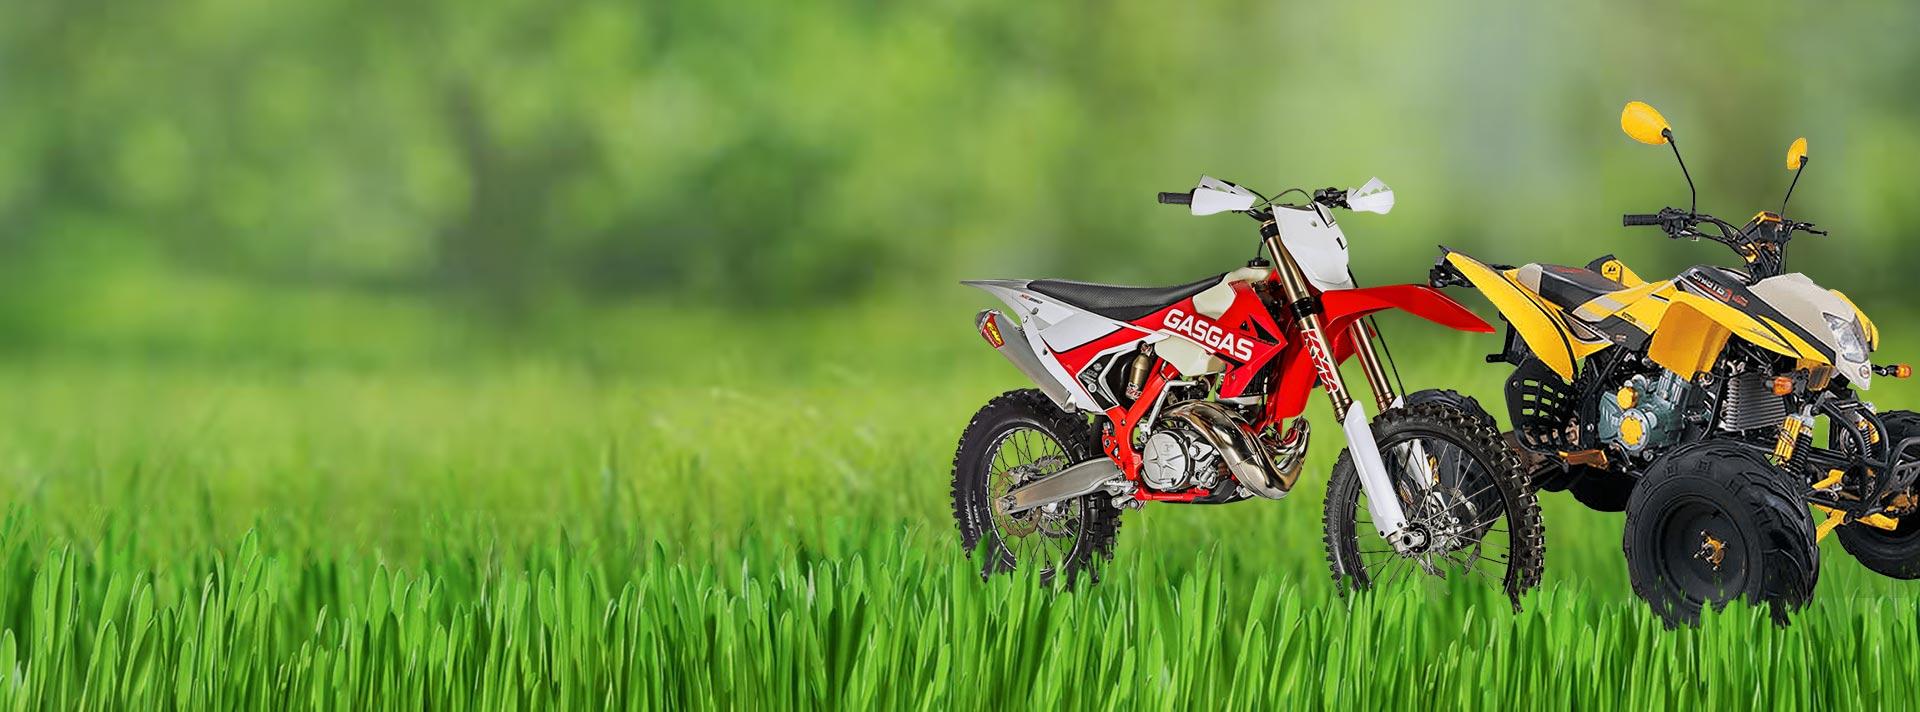 ervis-ctyrkolek-motocyklu-boskovice